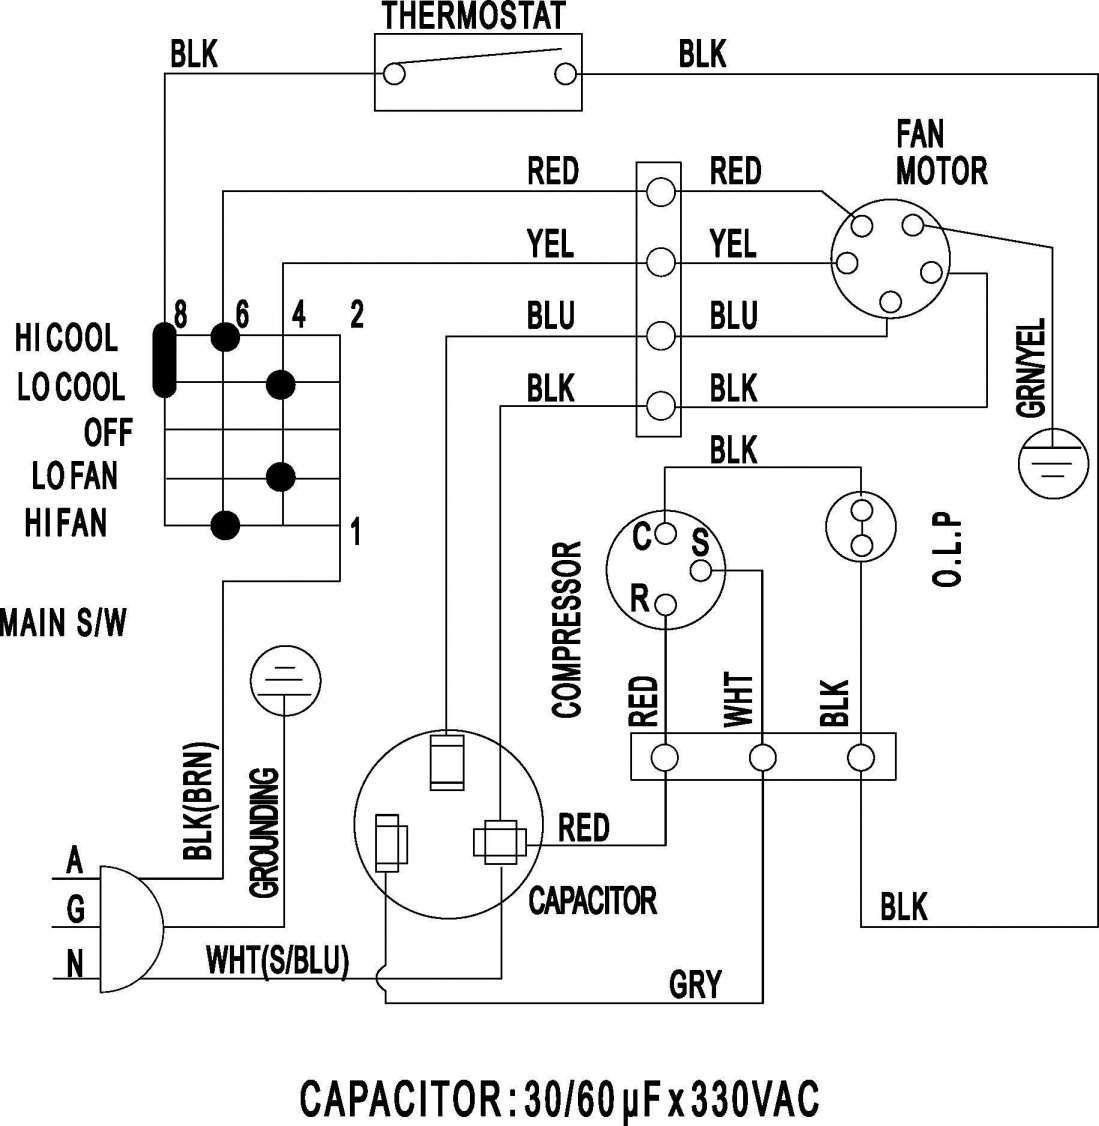 17 Ac Electrical Wiring Diagram Wiring Diagram Wiringg Net Electrical Circuit Diagram Ac Wiring Ac Capacitor